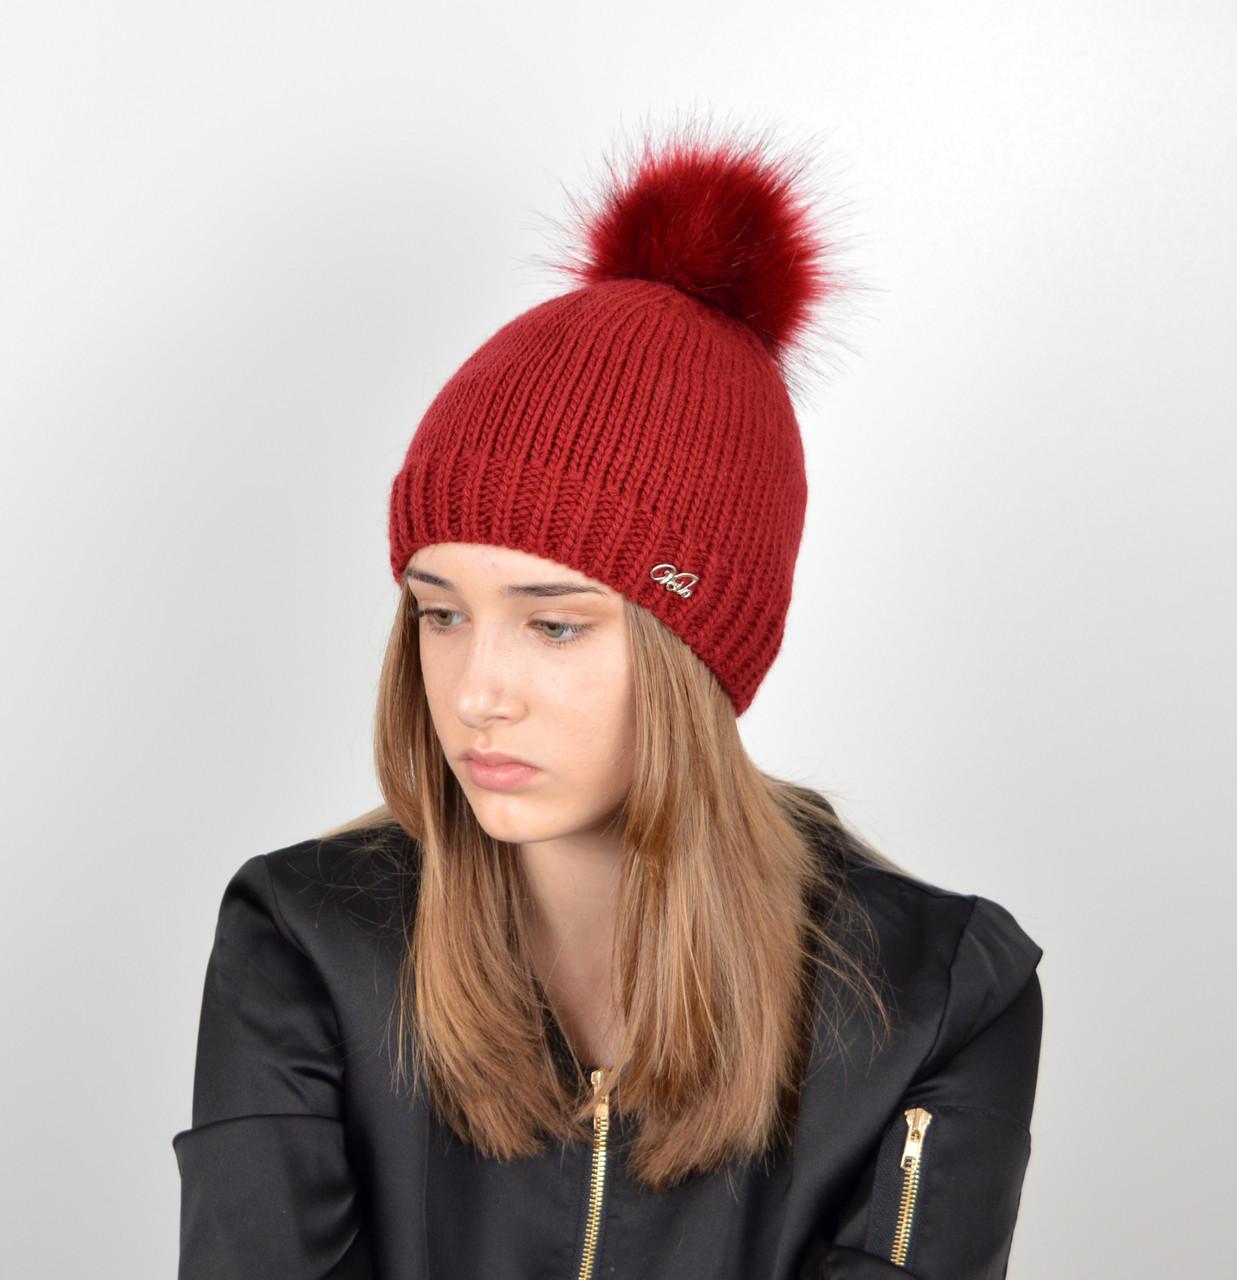 Жіноча шапка з помпоном 3348 бордо